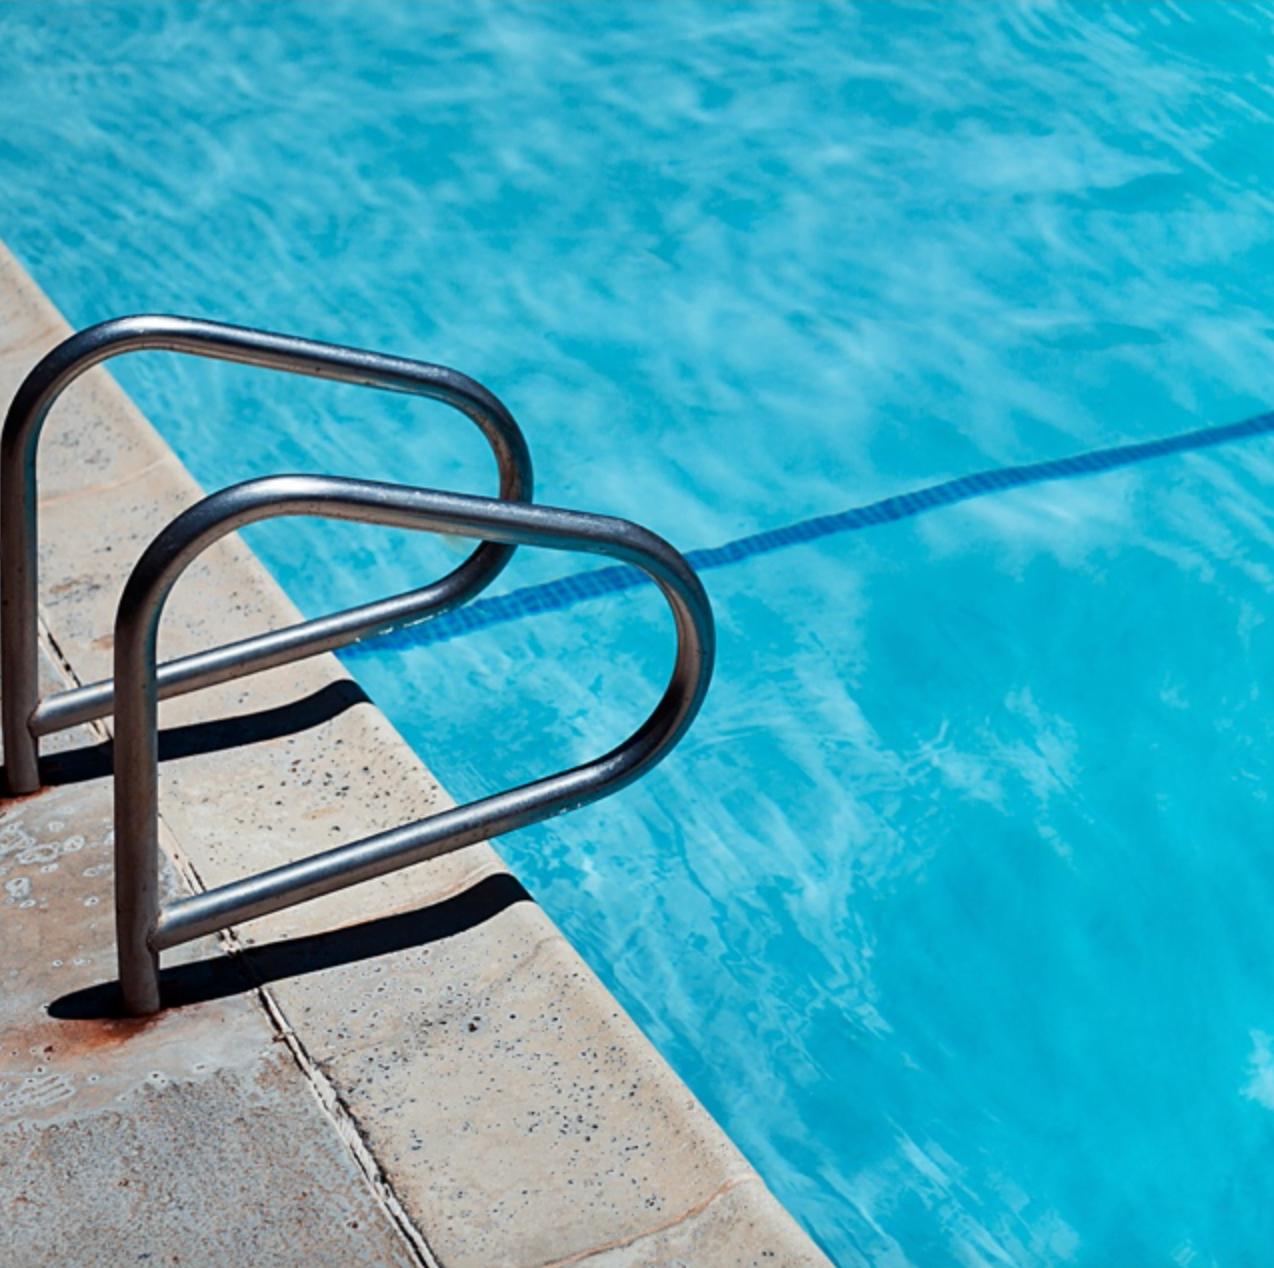 360 Magazine, Purdue University, Swimming pool, COVID-19